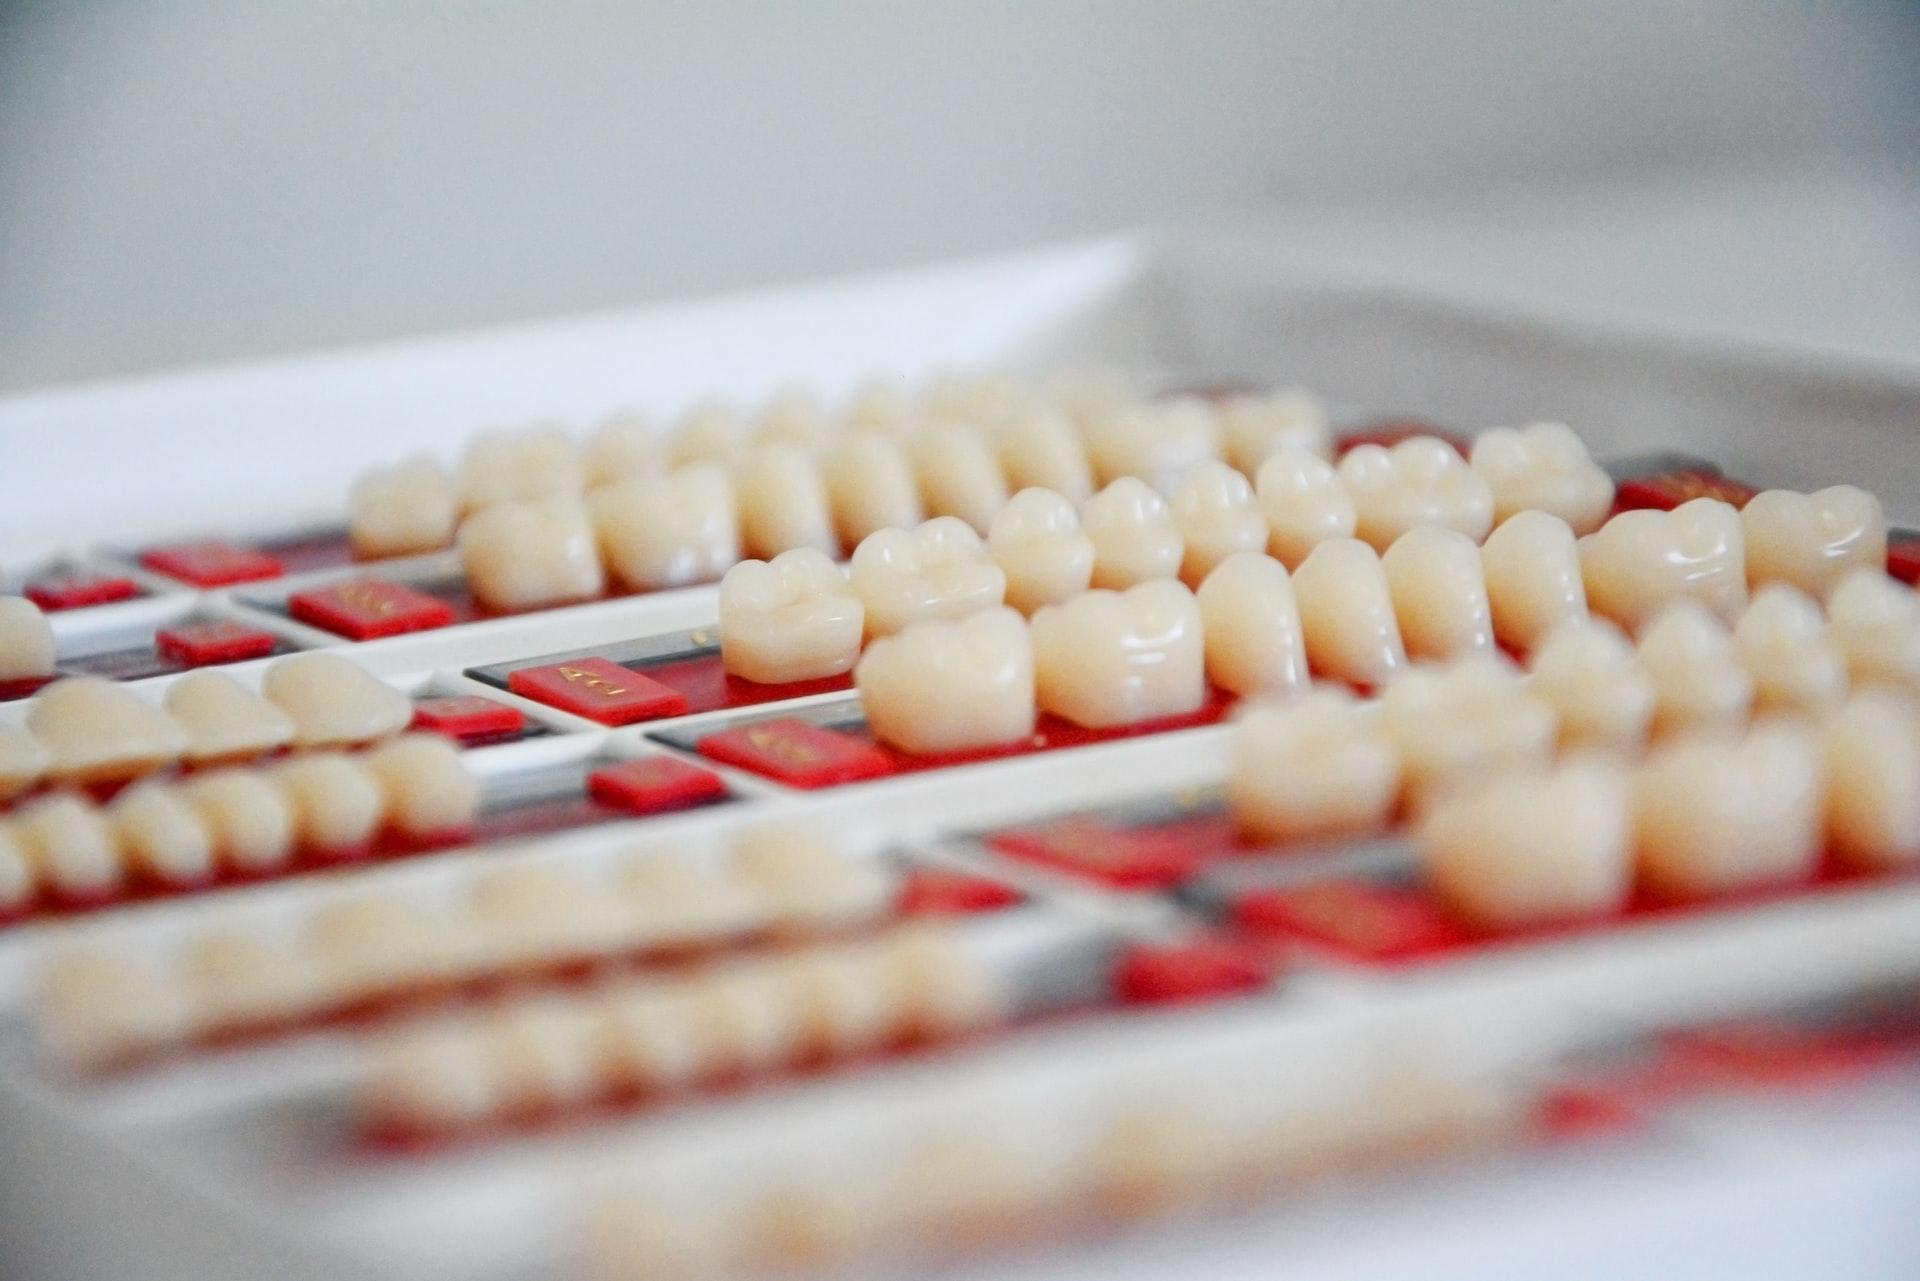 nj dental bridges